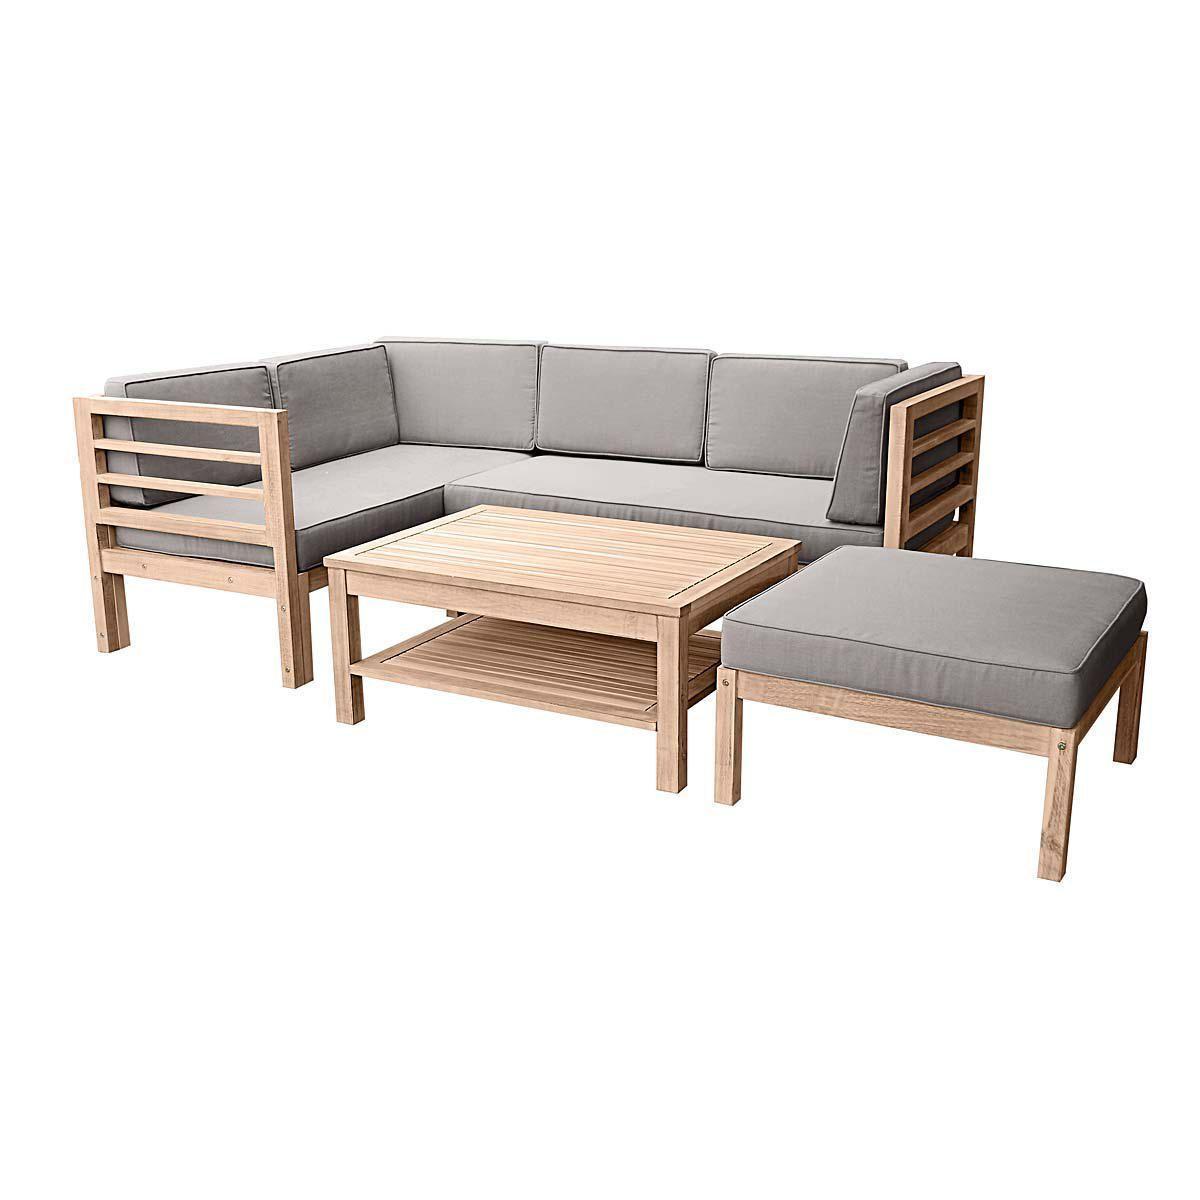 Gartenmöbel-Set Variabel, 3-tlg., inkl. Auflagen, Holz Jetzt ...